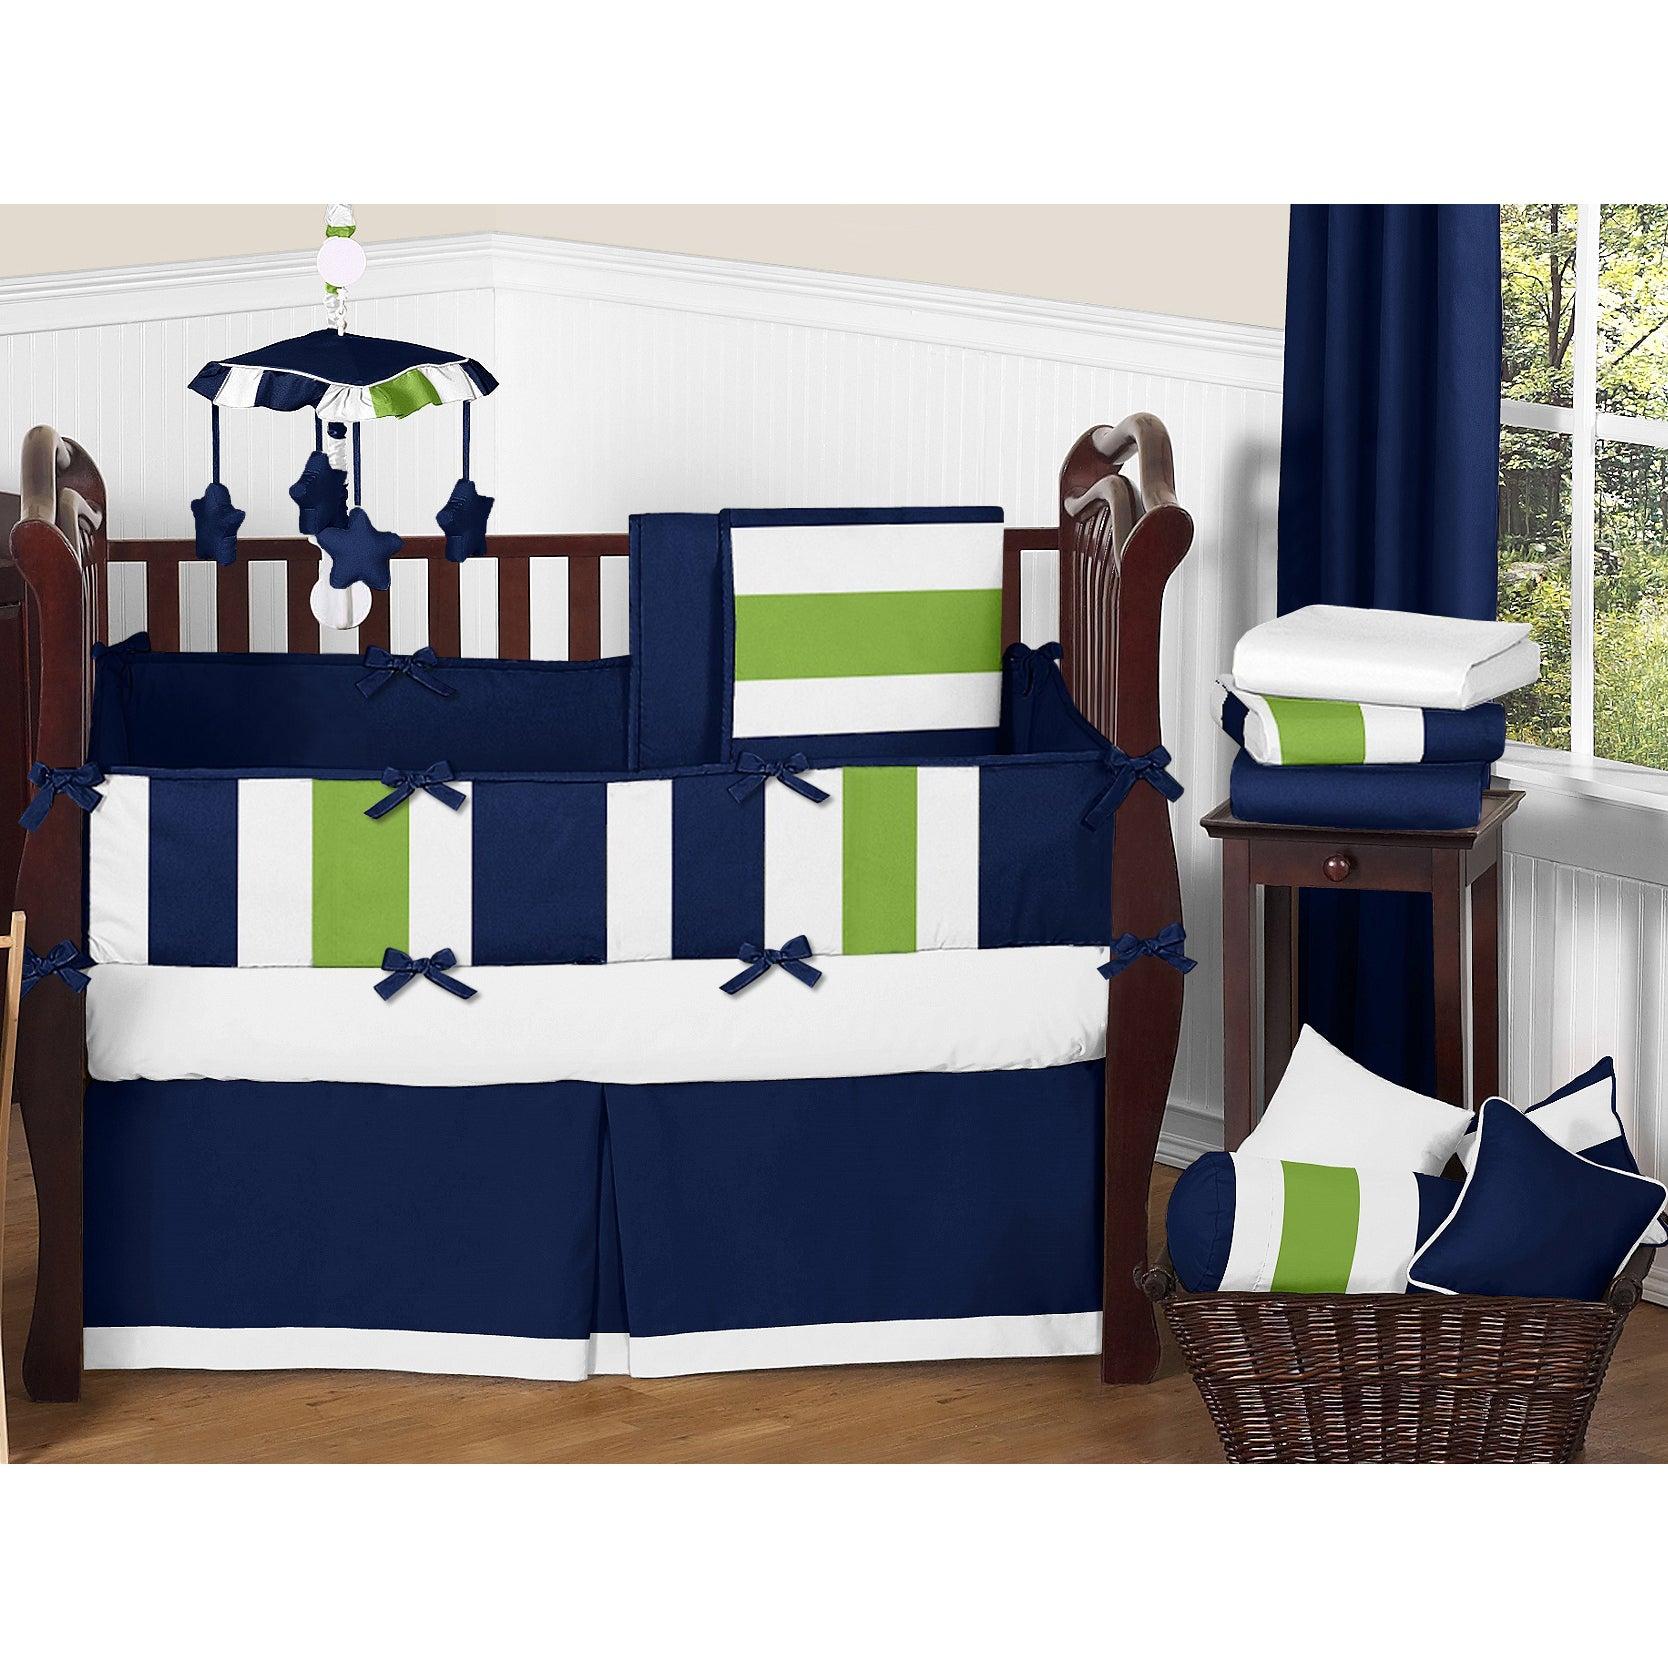 Sweet jojo designs navy blue lime green white stripe 9 - Navy blue and green bedding ...